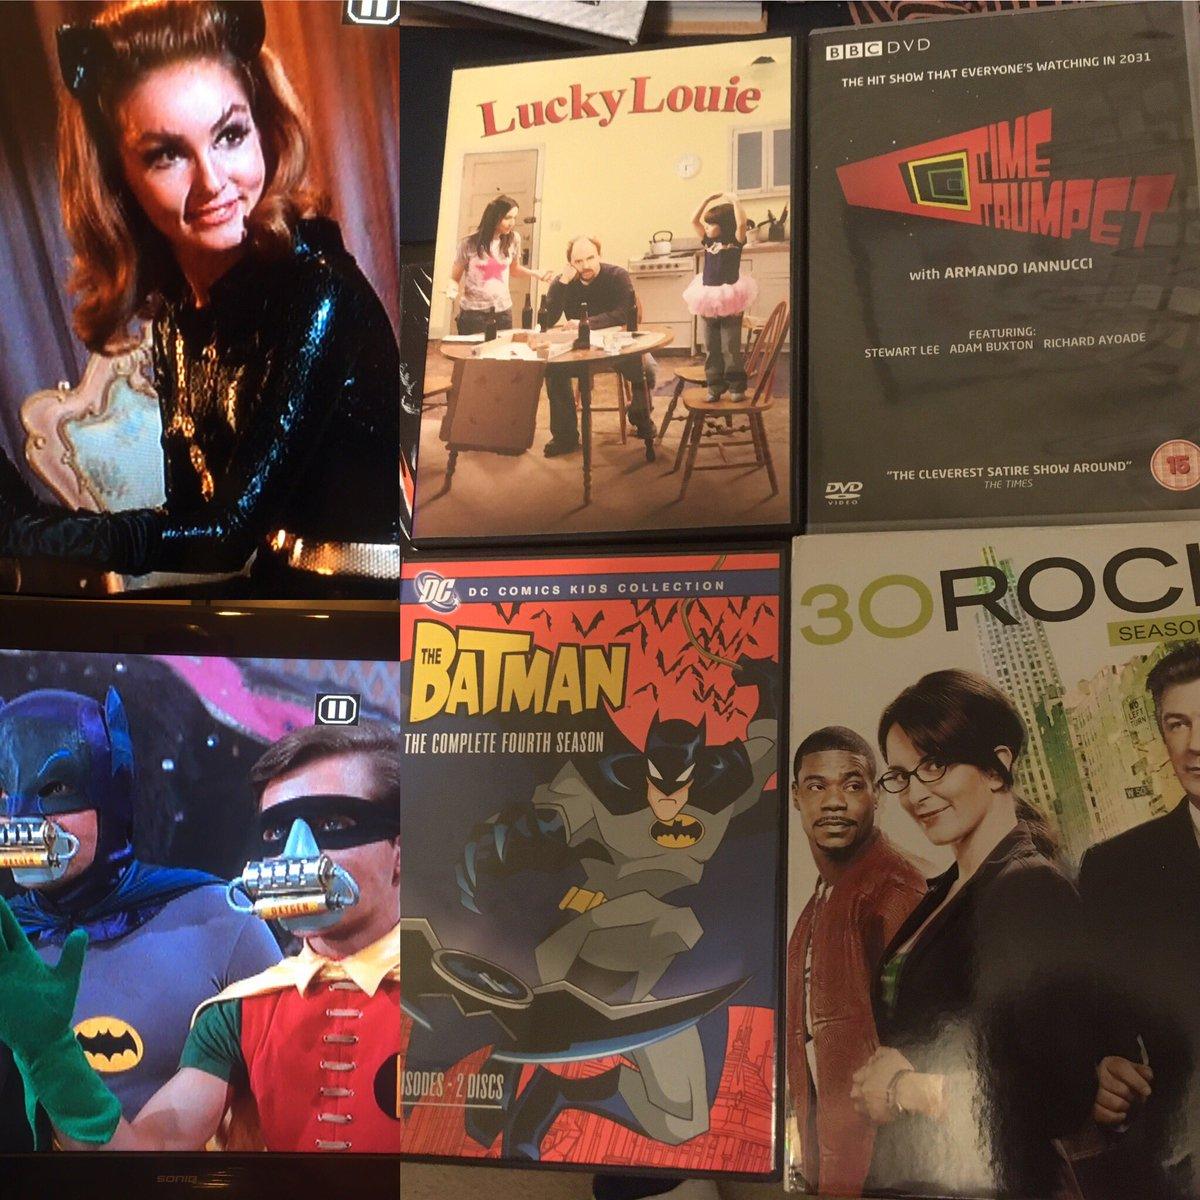 test Twitter Media - After a short gap watching Season 1 of 60's Batman I now move onto 2006 in my DVD TV viewing #batman #30rock #louisck #timetrumpet https://t.co/7DUqdfGVmS